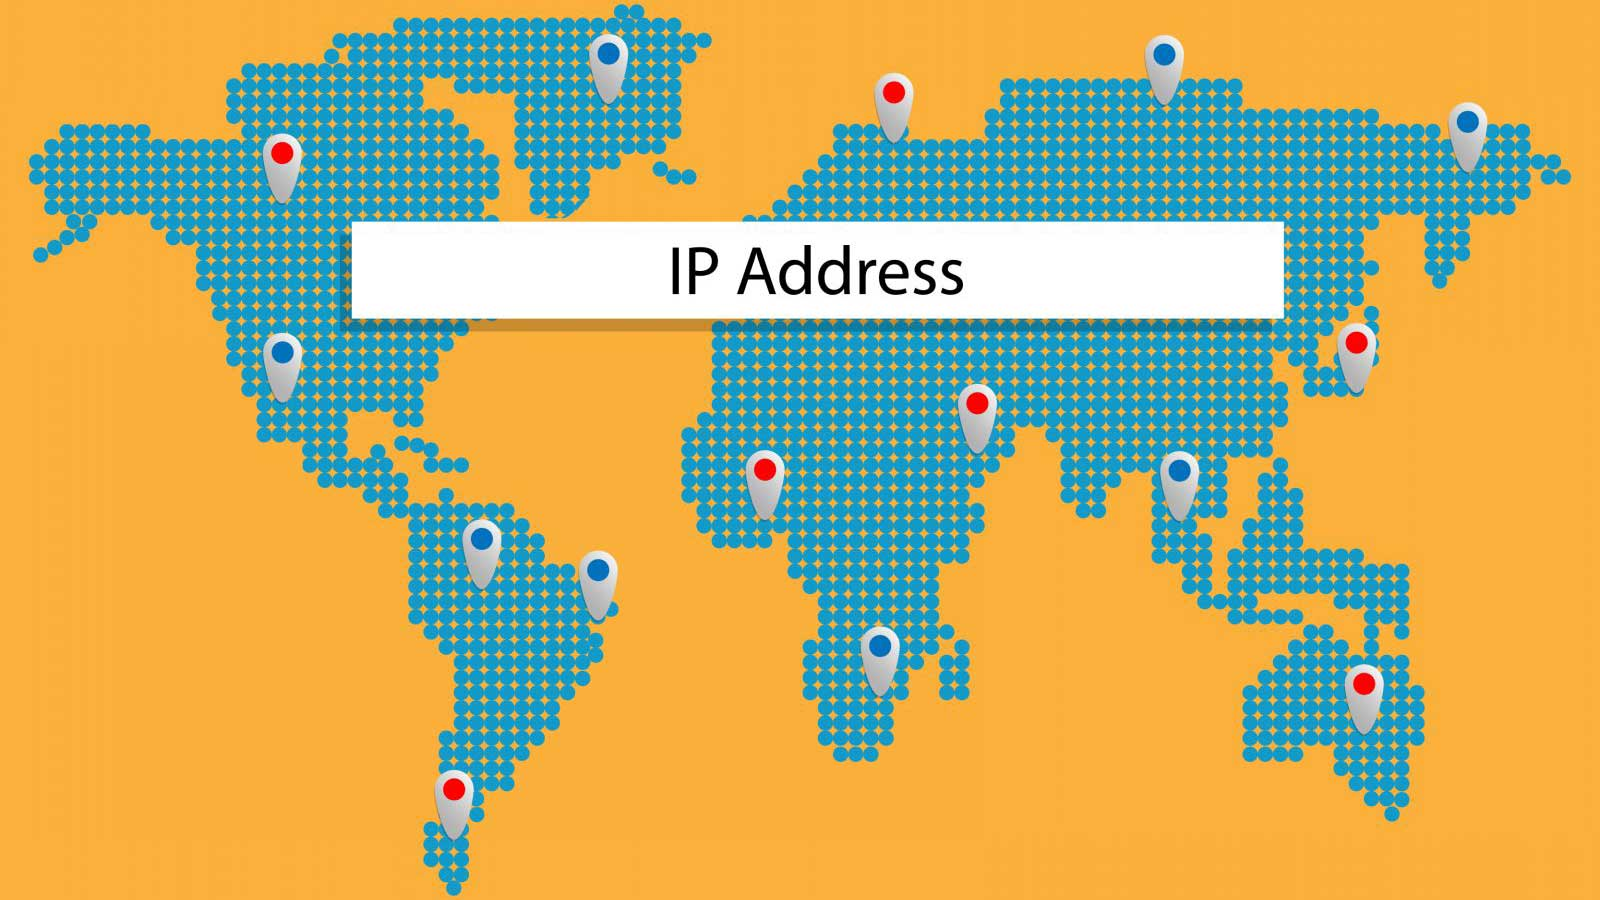 ipv4 address brokers